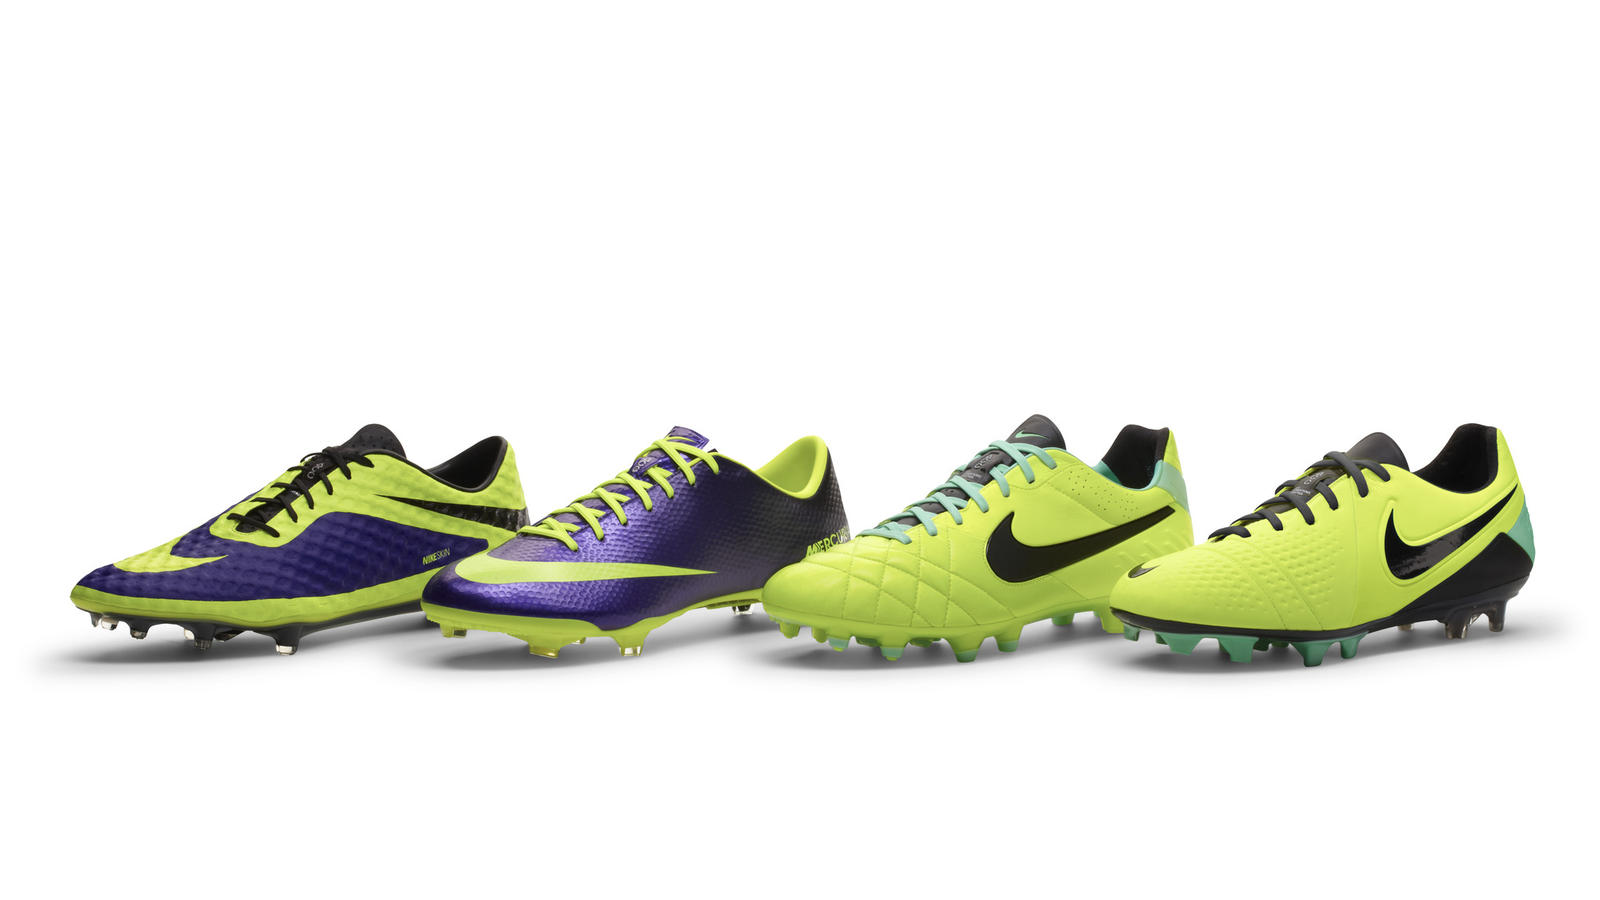 Nike Football Hi-Vis Collection